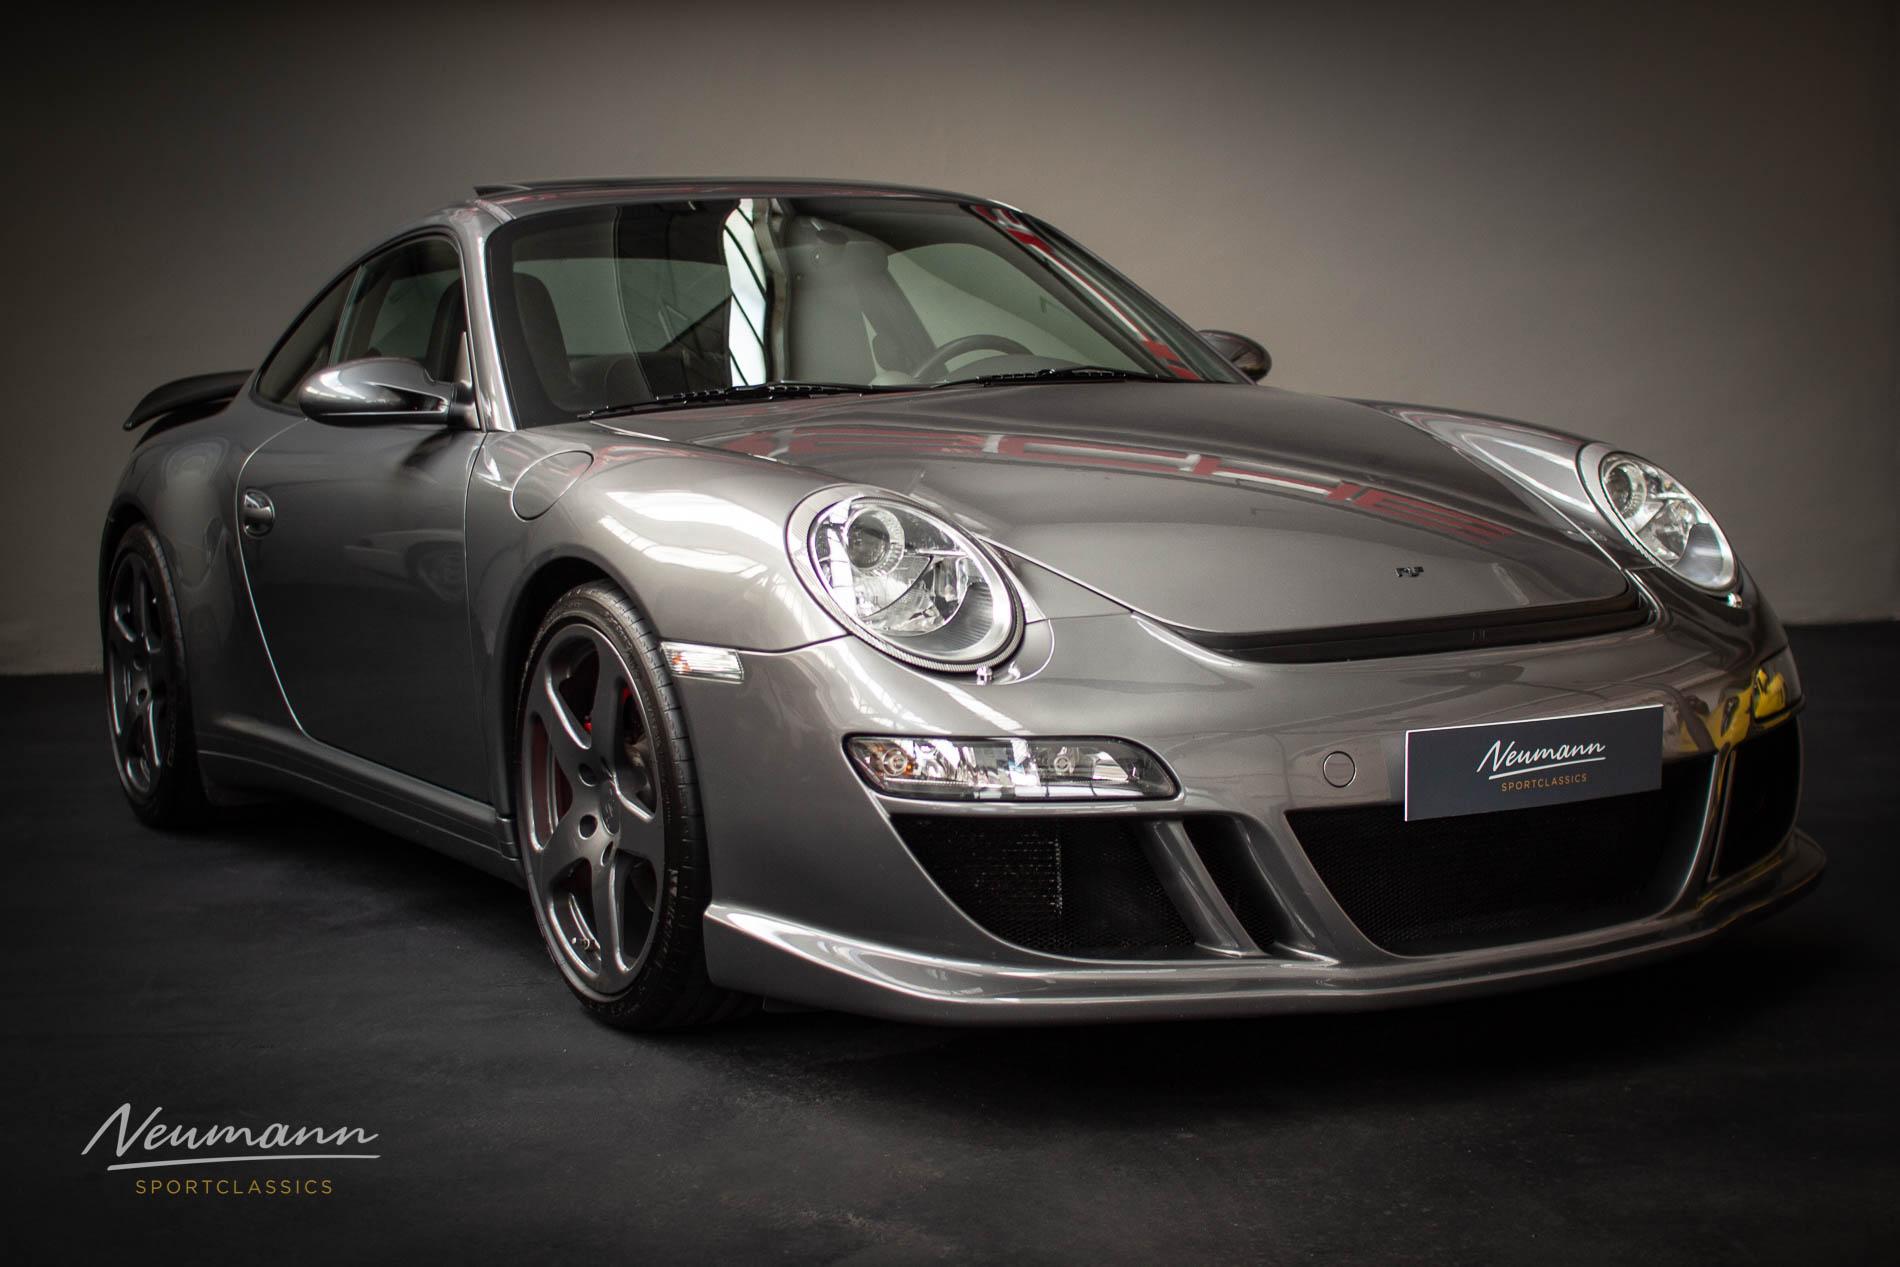 Porsche RUF R Kompressor